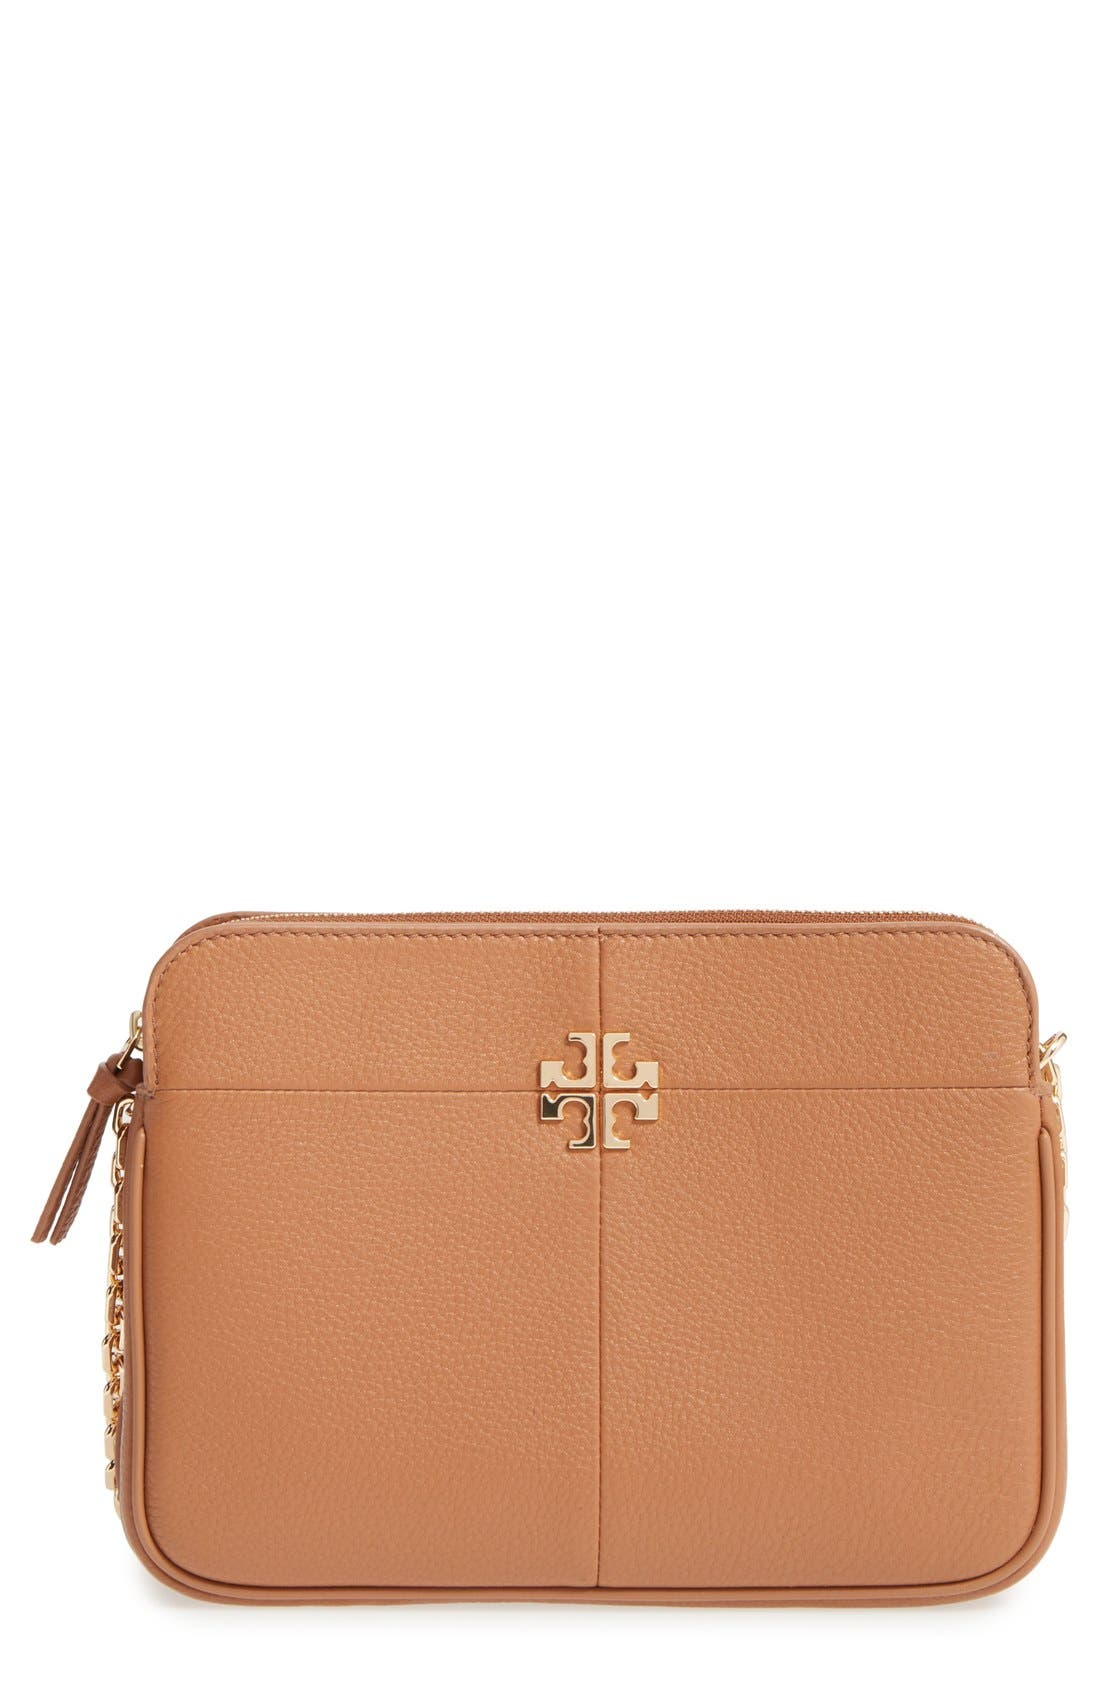 Tory Burch Ivy Leather Crossbody Bag